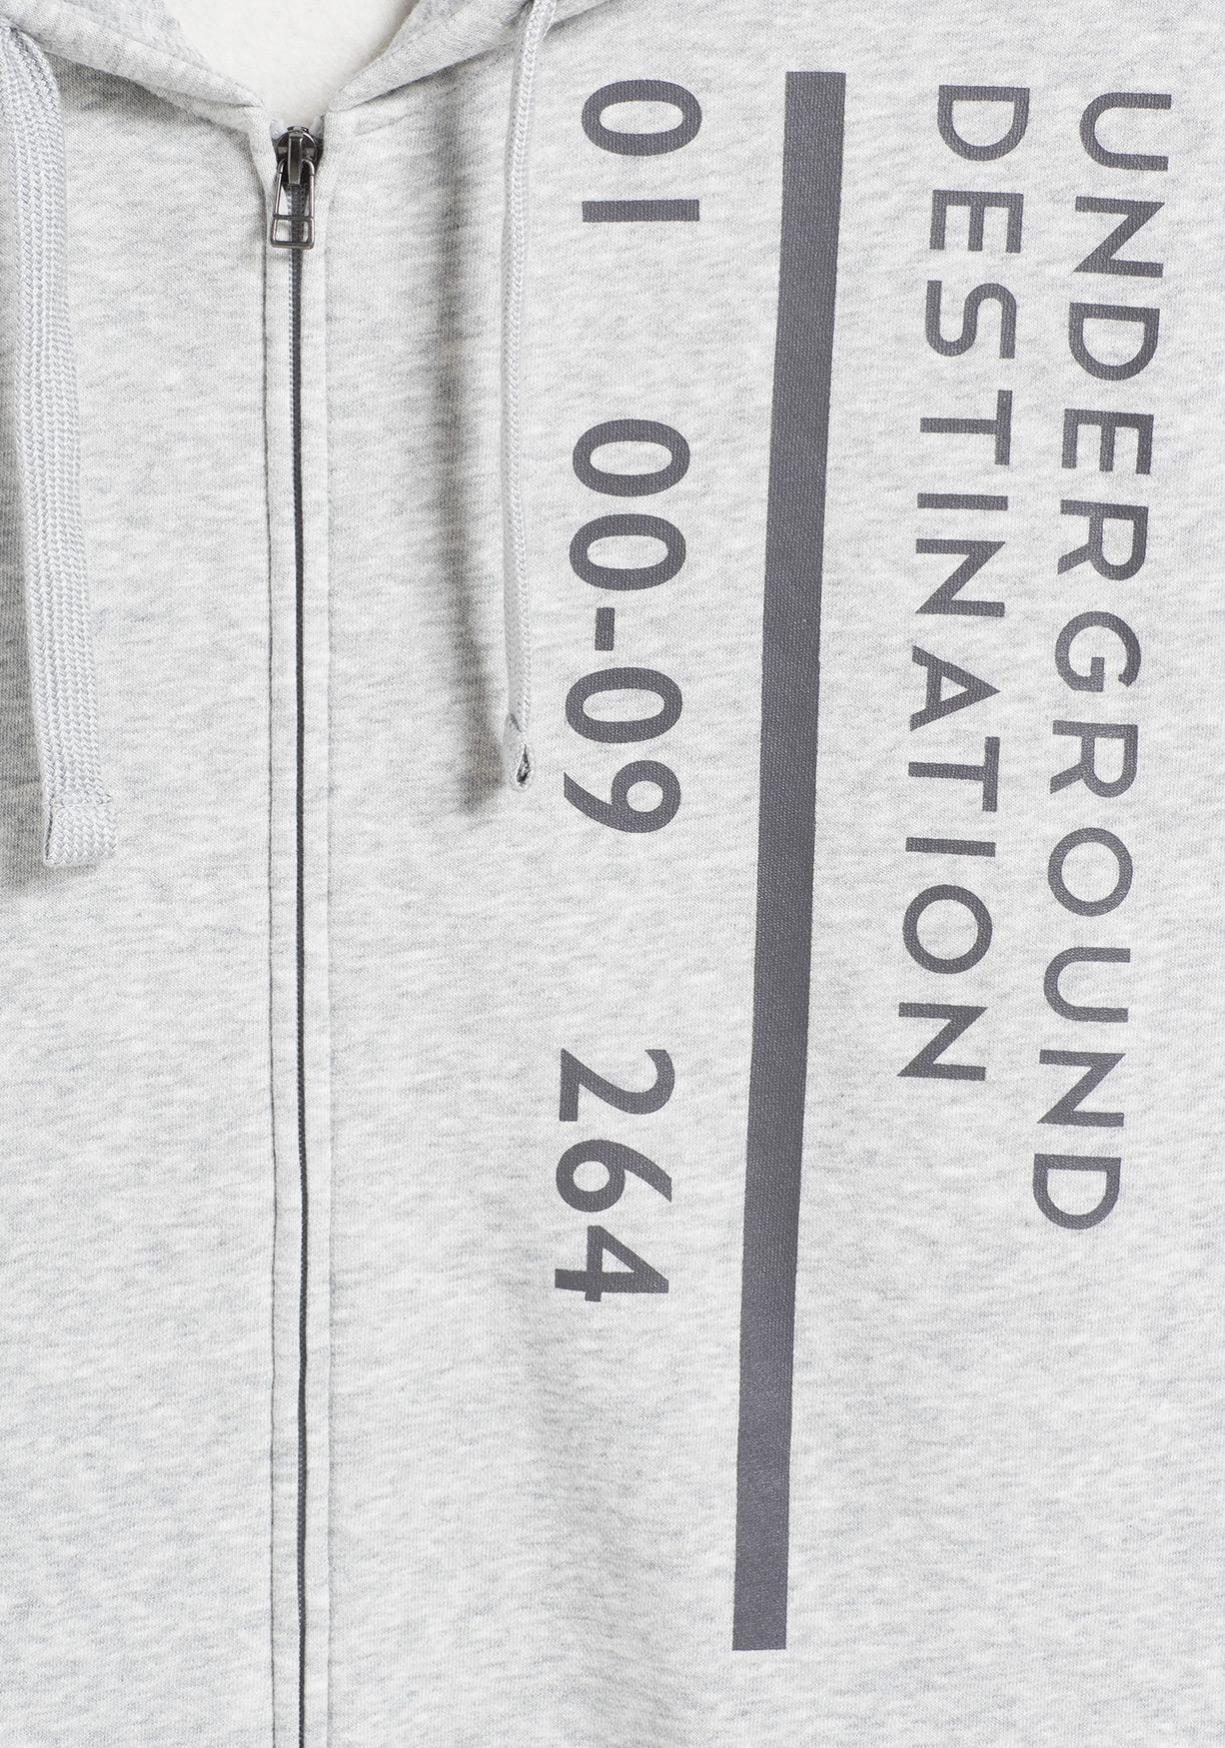 1acf4e23b6d Comprar Sudadera estampada para tallas grandes TEX. ¡Aprovéchate de ...